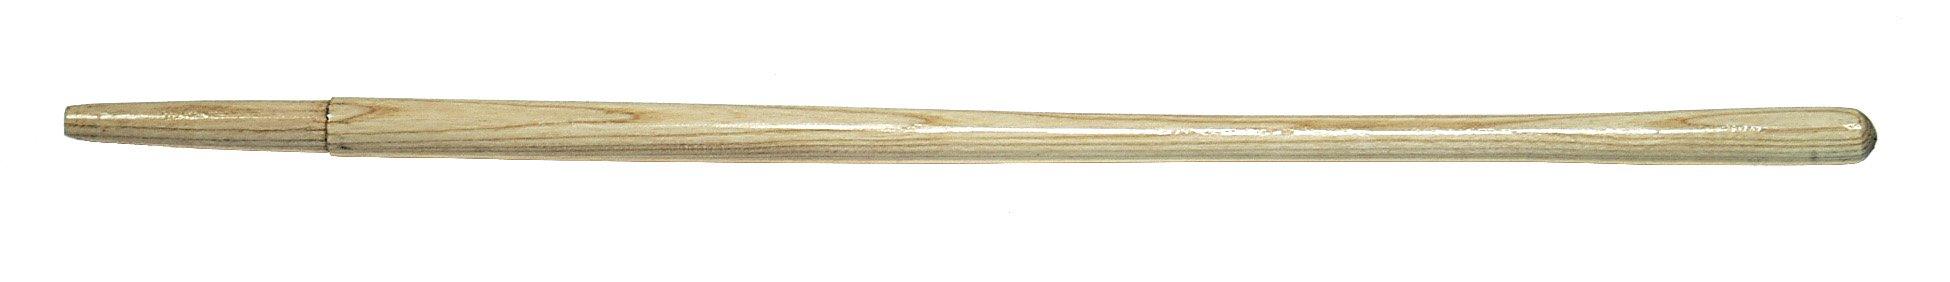 Link Handles 66800 Closed Back Solid Socket Shovel Handle with Shoulder, Clear Finish, 6-1/2'' Chuck, 1-1/2'' Diameter x 46-1/2'' Length